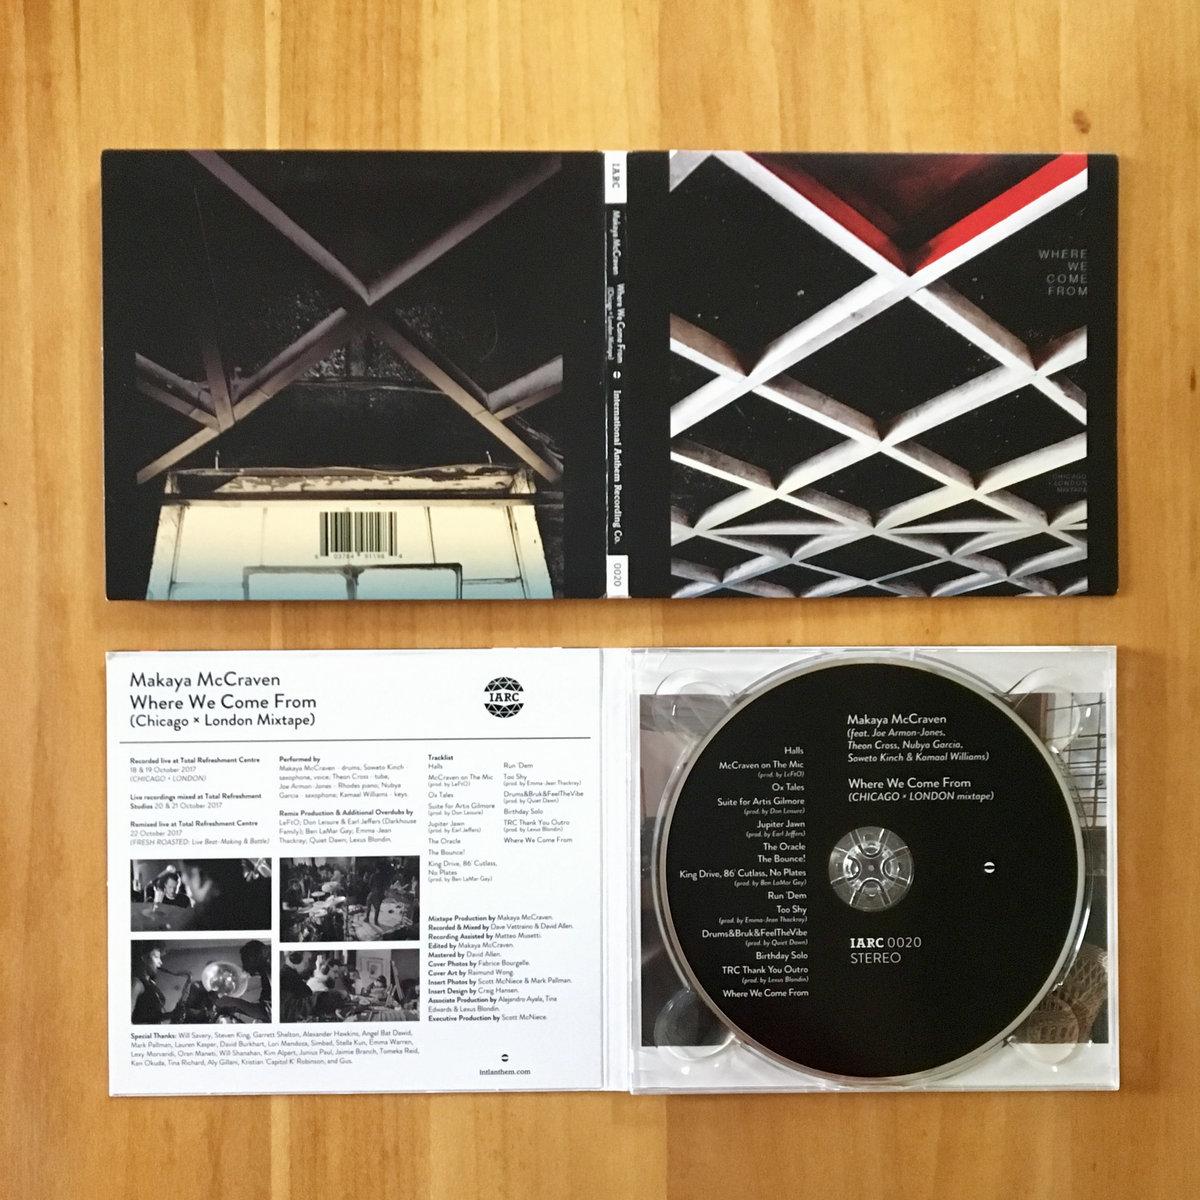 Suite For Artis Gilmore | International Anthem